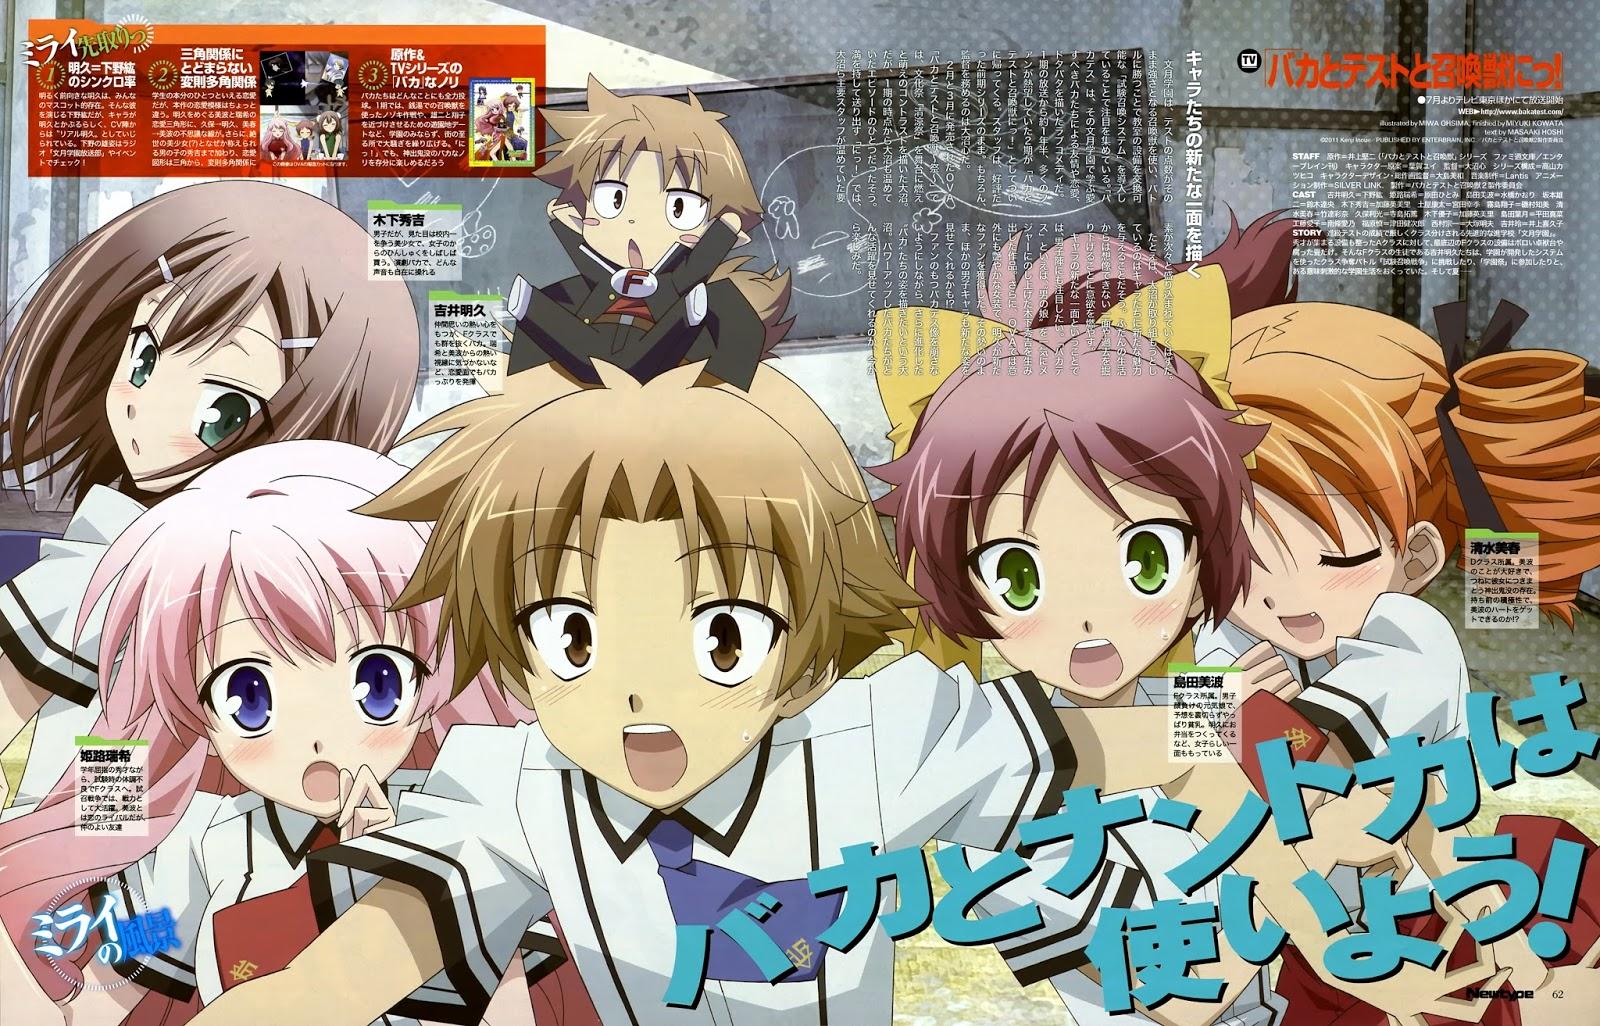 Baka to Test to Shoukanjuu Ni! Bluray [BD]   Episodes